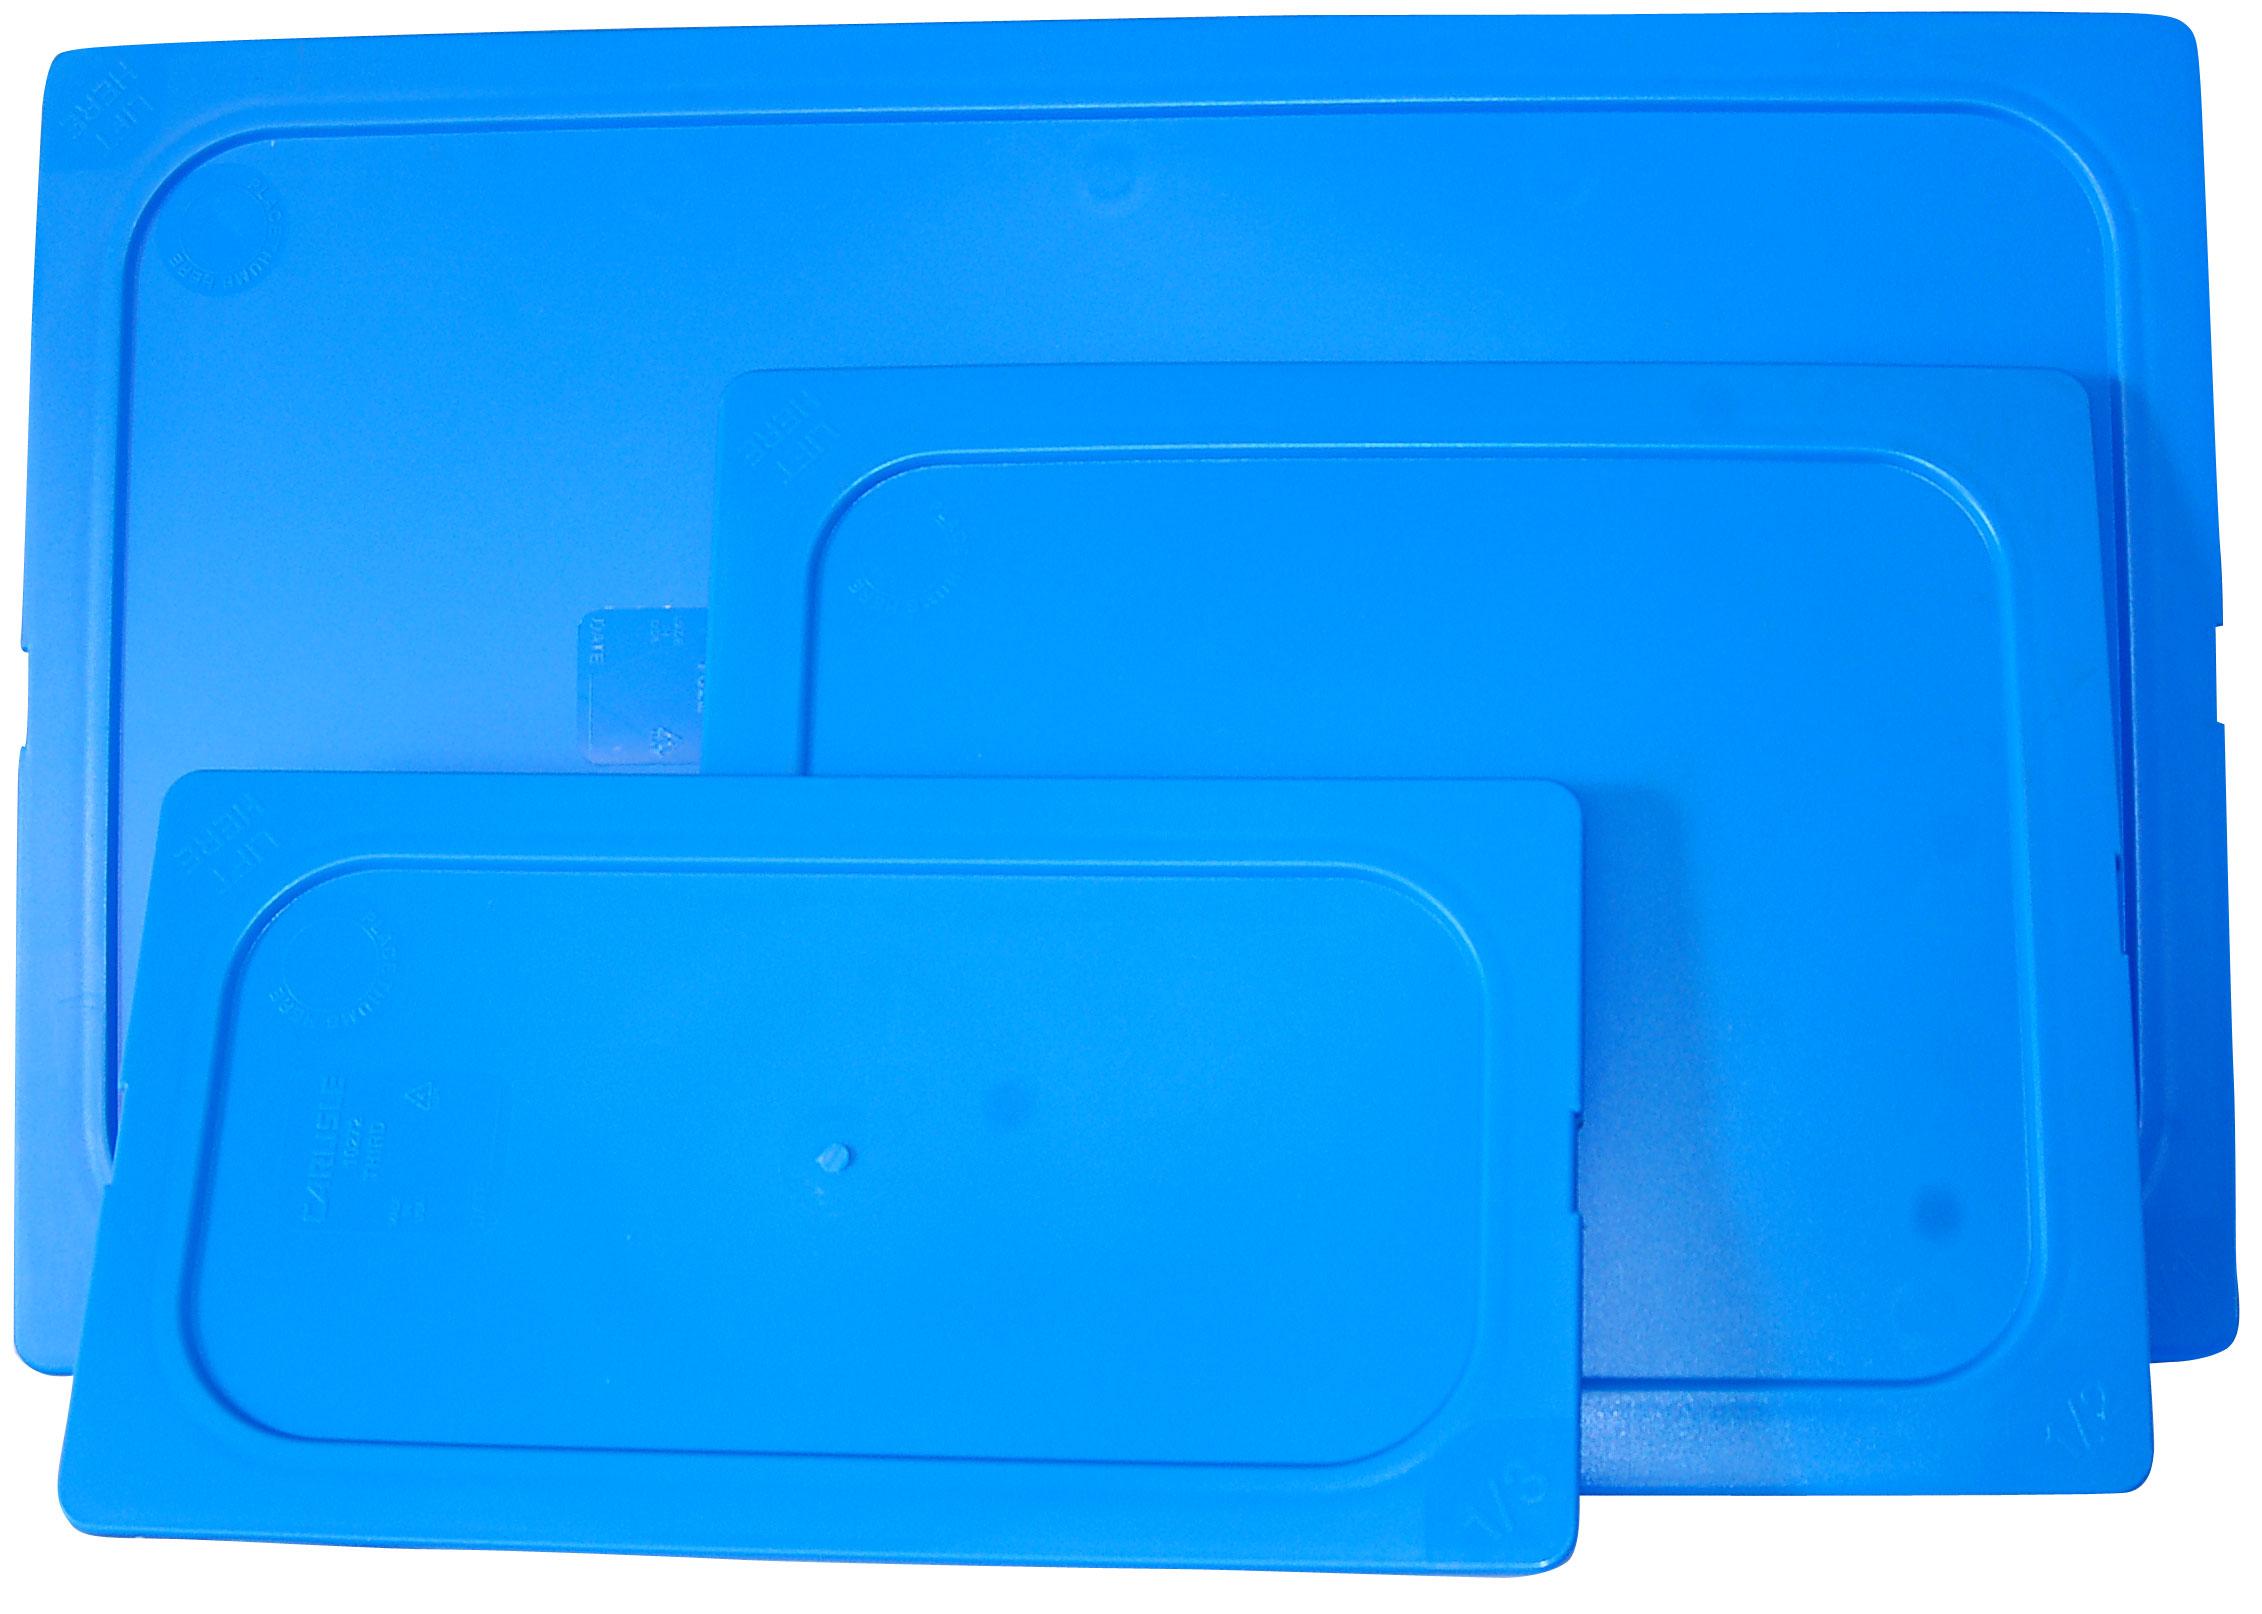 INSERT - HALF LID SNAP ON (BLUE)